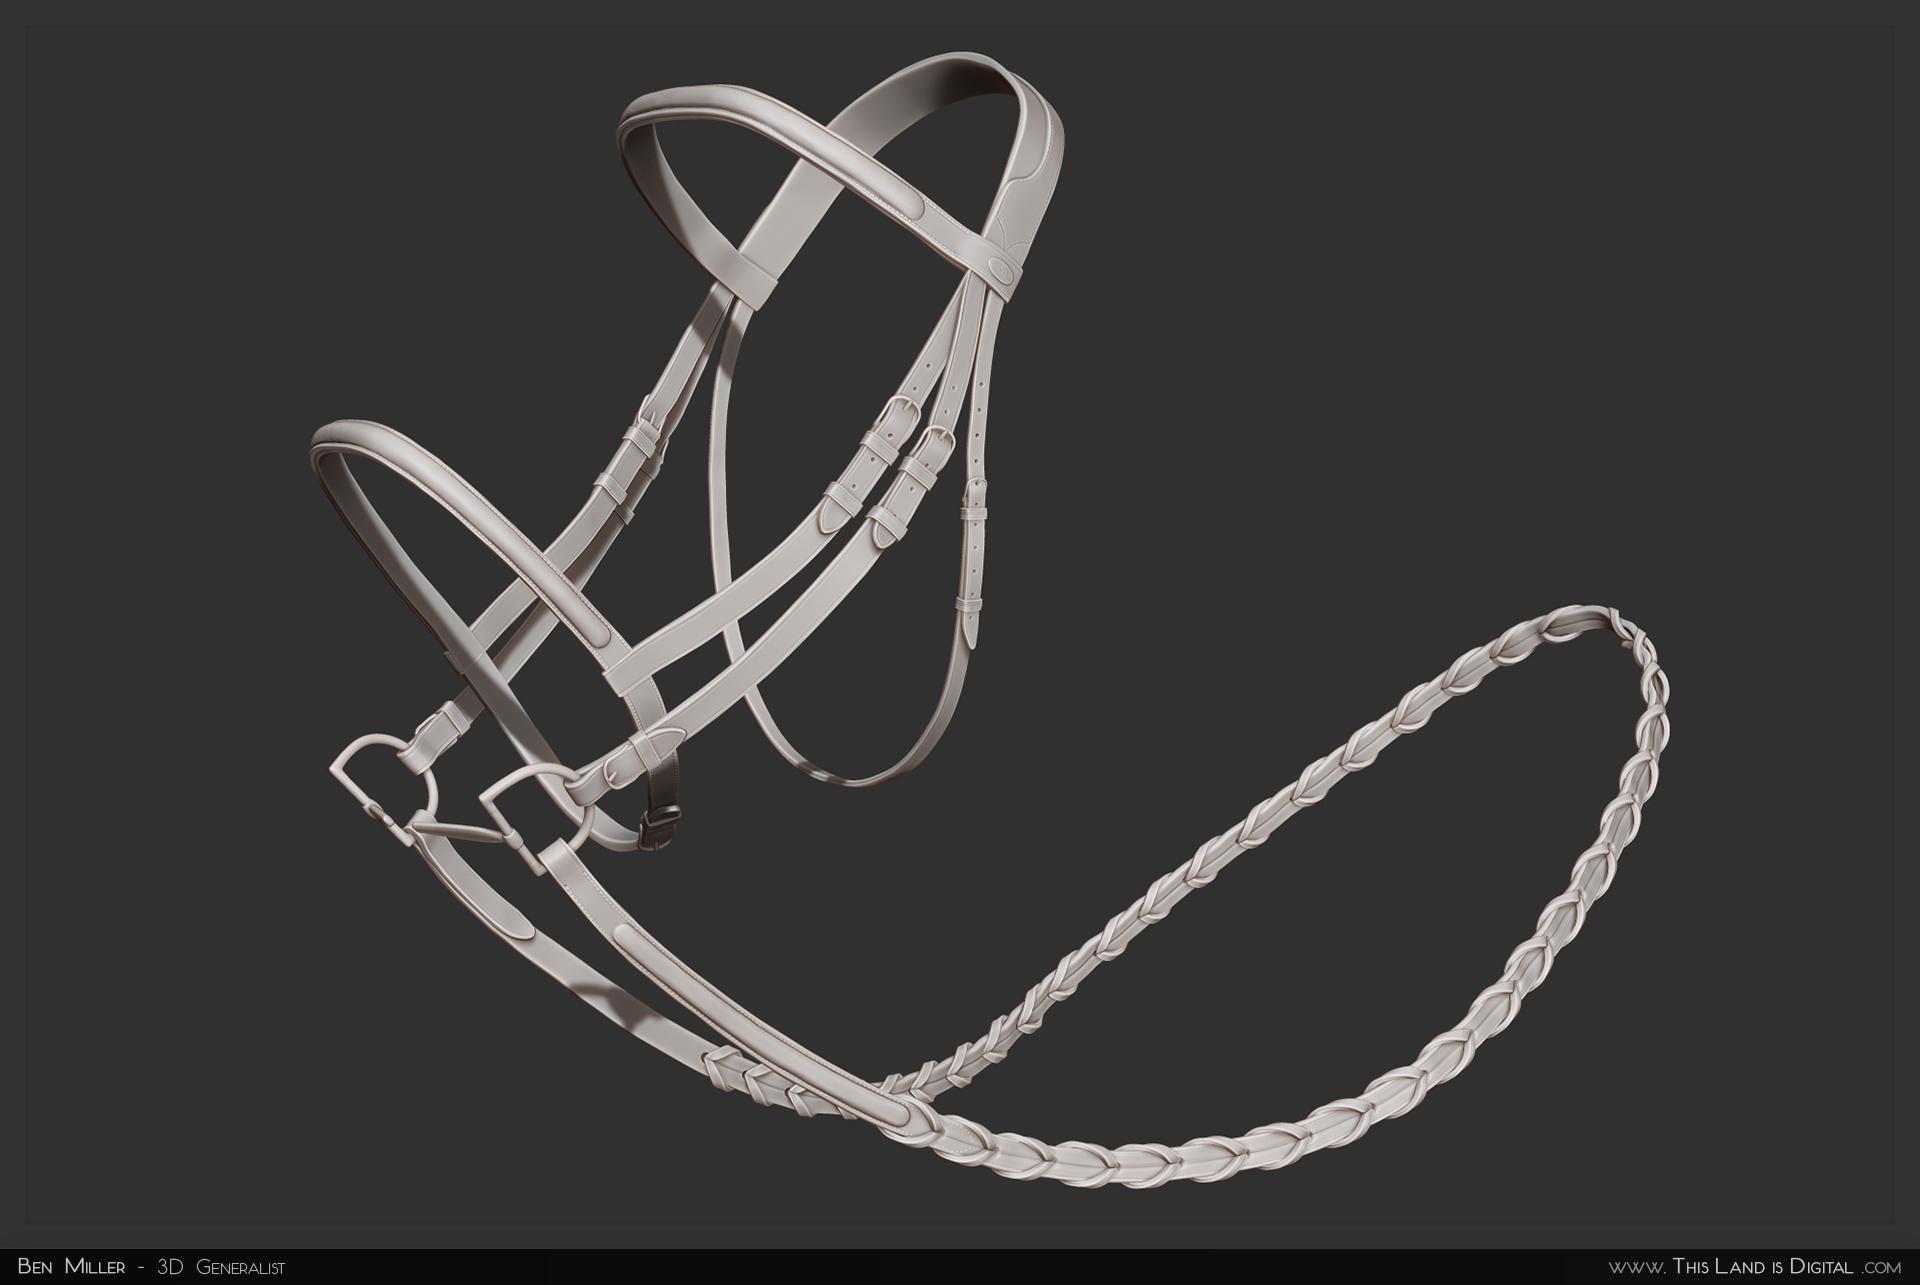 TLiD_WeddingSculpture-Bridle.jpg